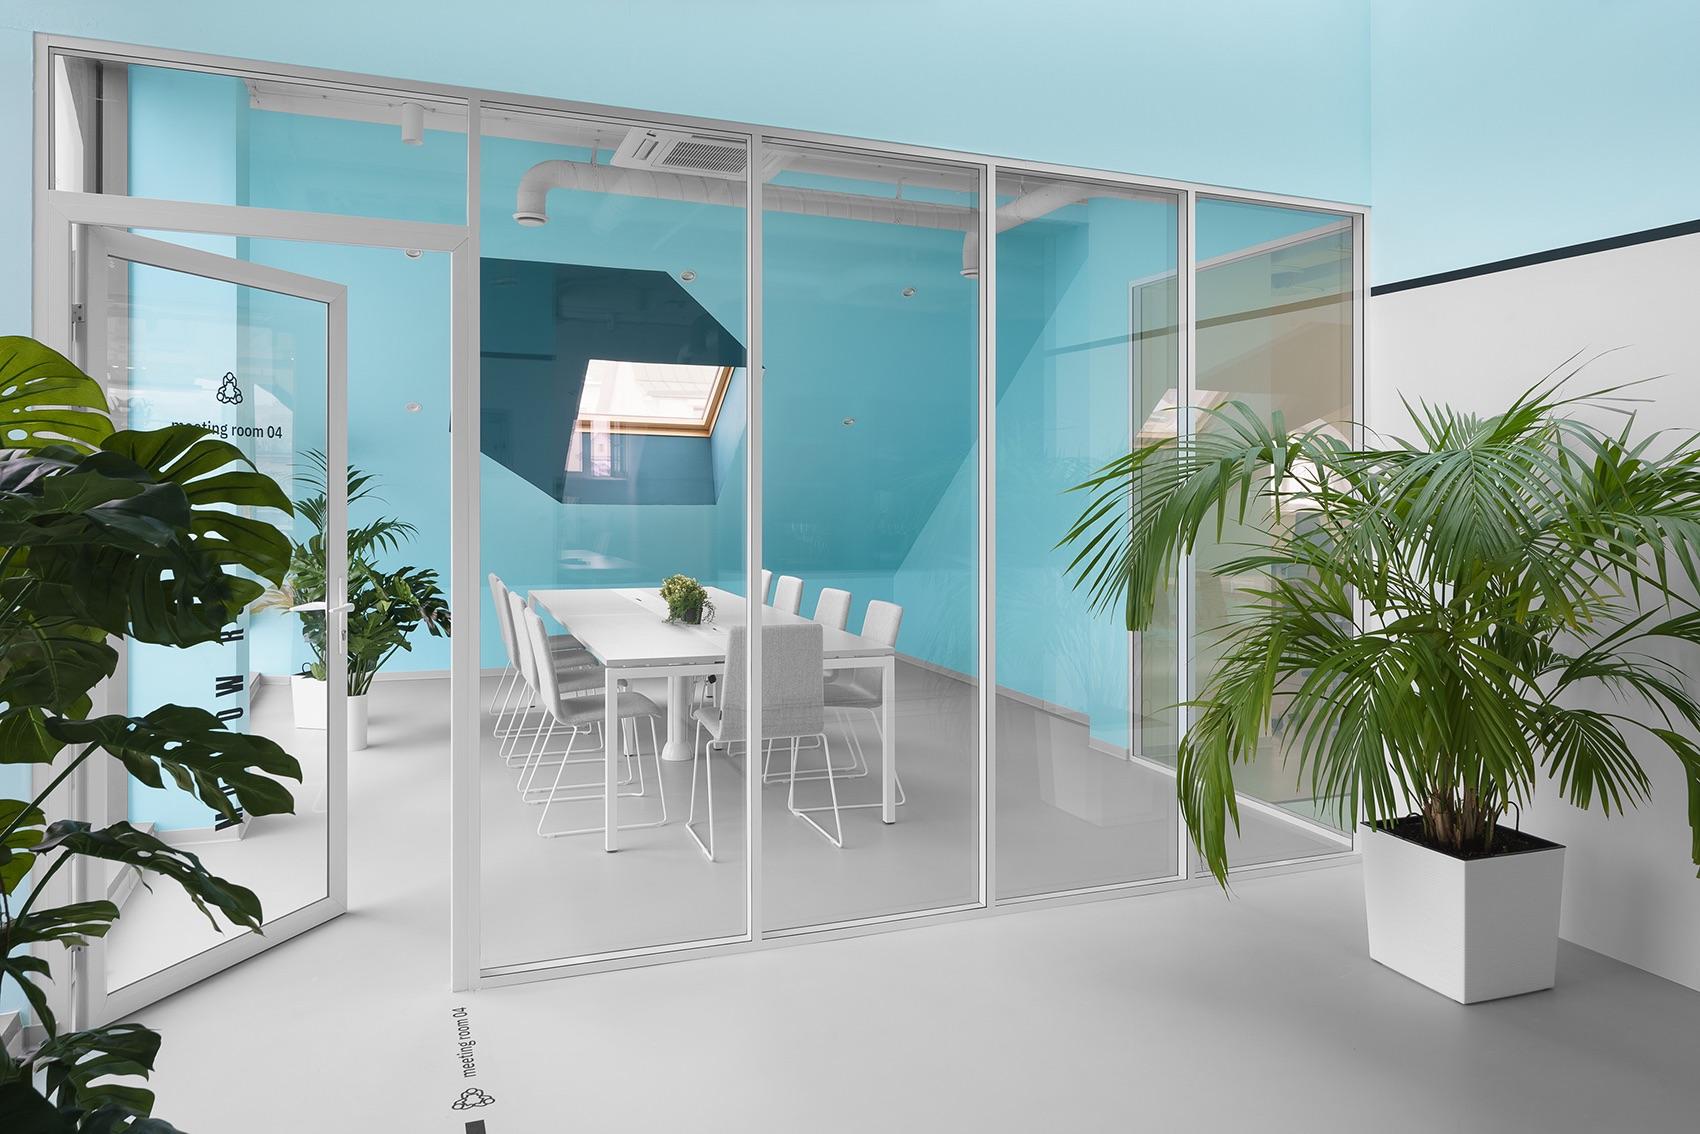 appodeal-office-minsk-14